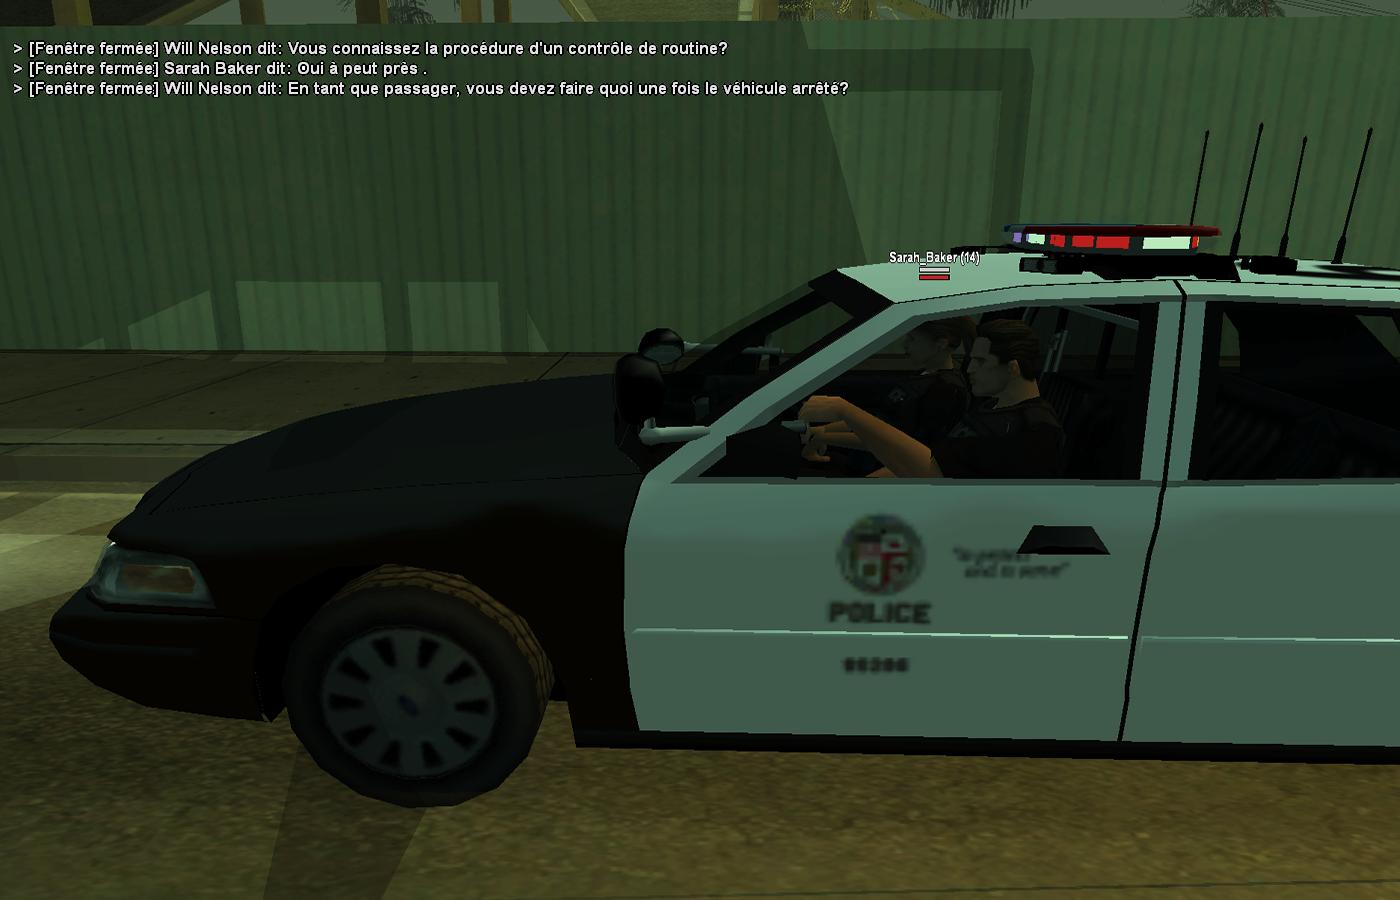 Los Santos Police Département #toprotectandtoserve (Part VI) - Page 3 1604446483-screen5